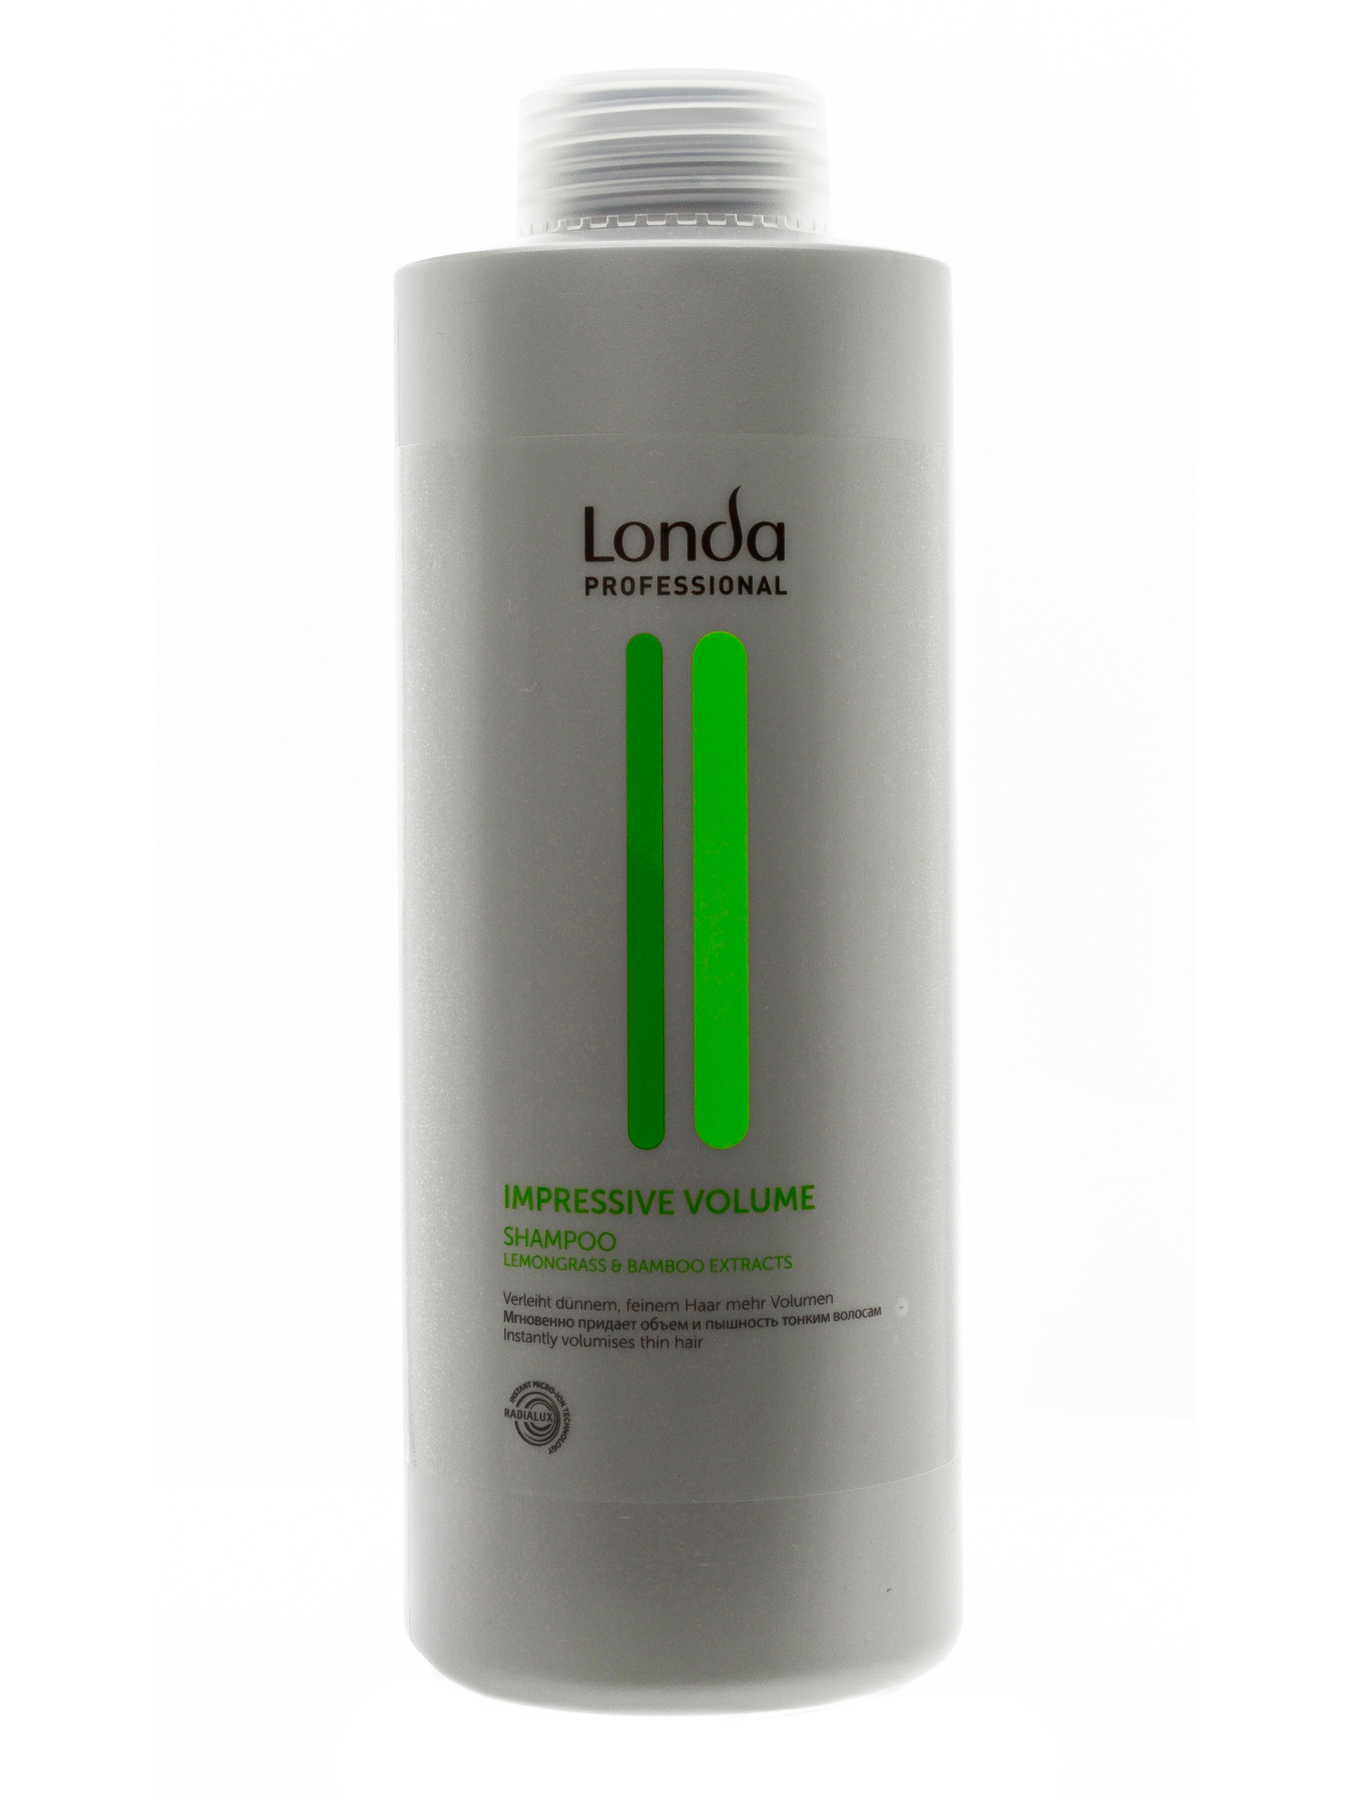 Londa Professional Shampoo Impressive Volume 1000 Ml